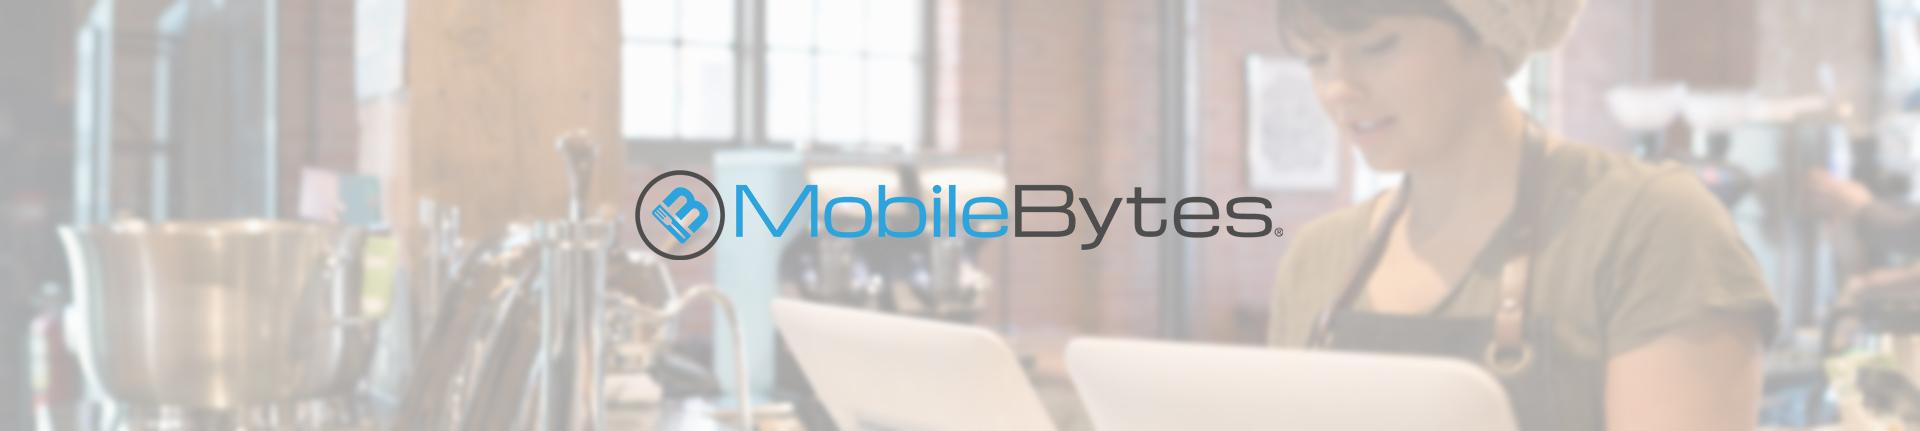 mobile bytes